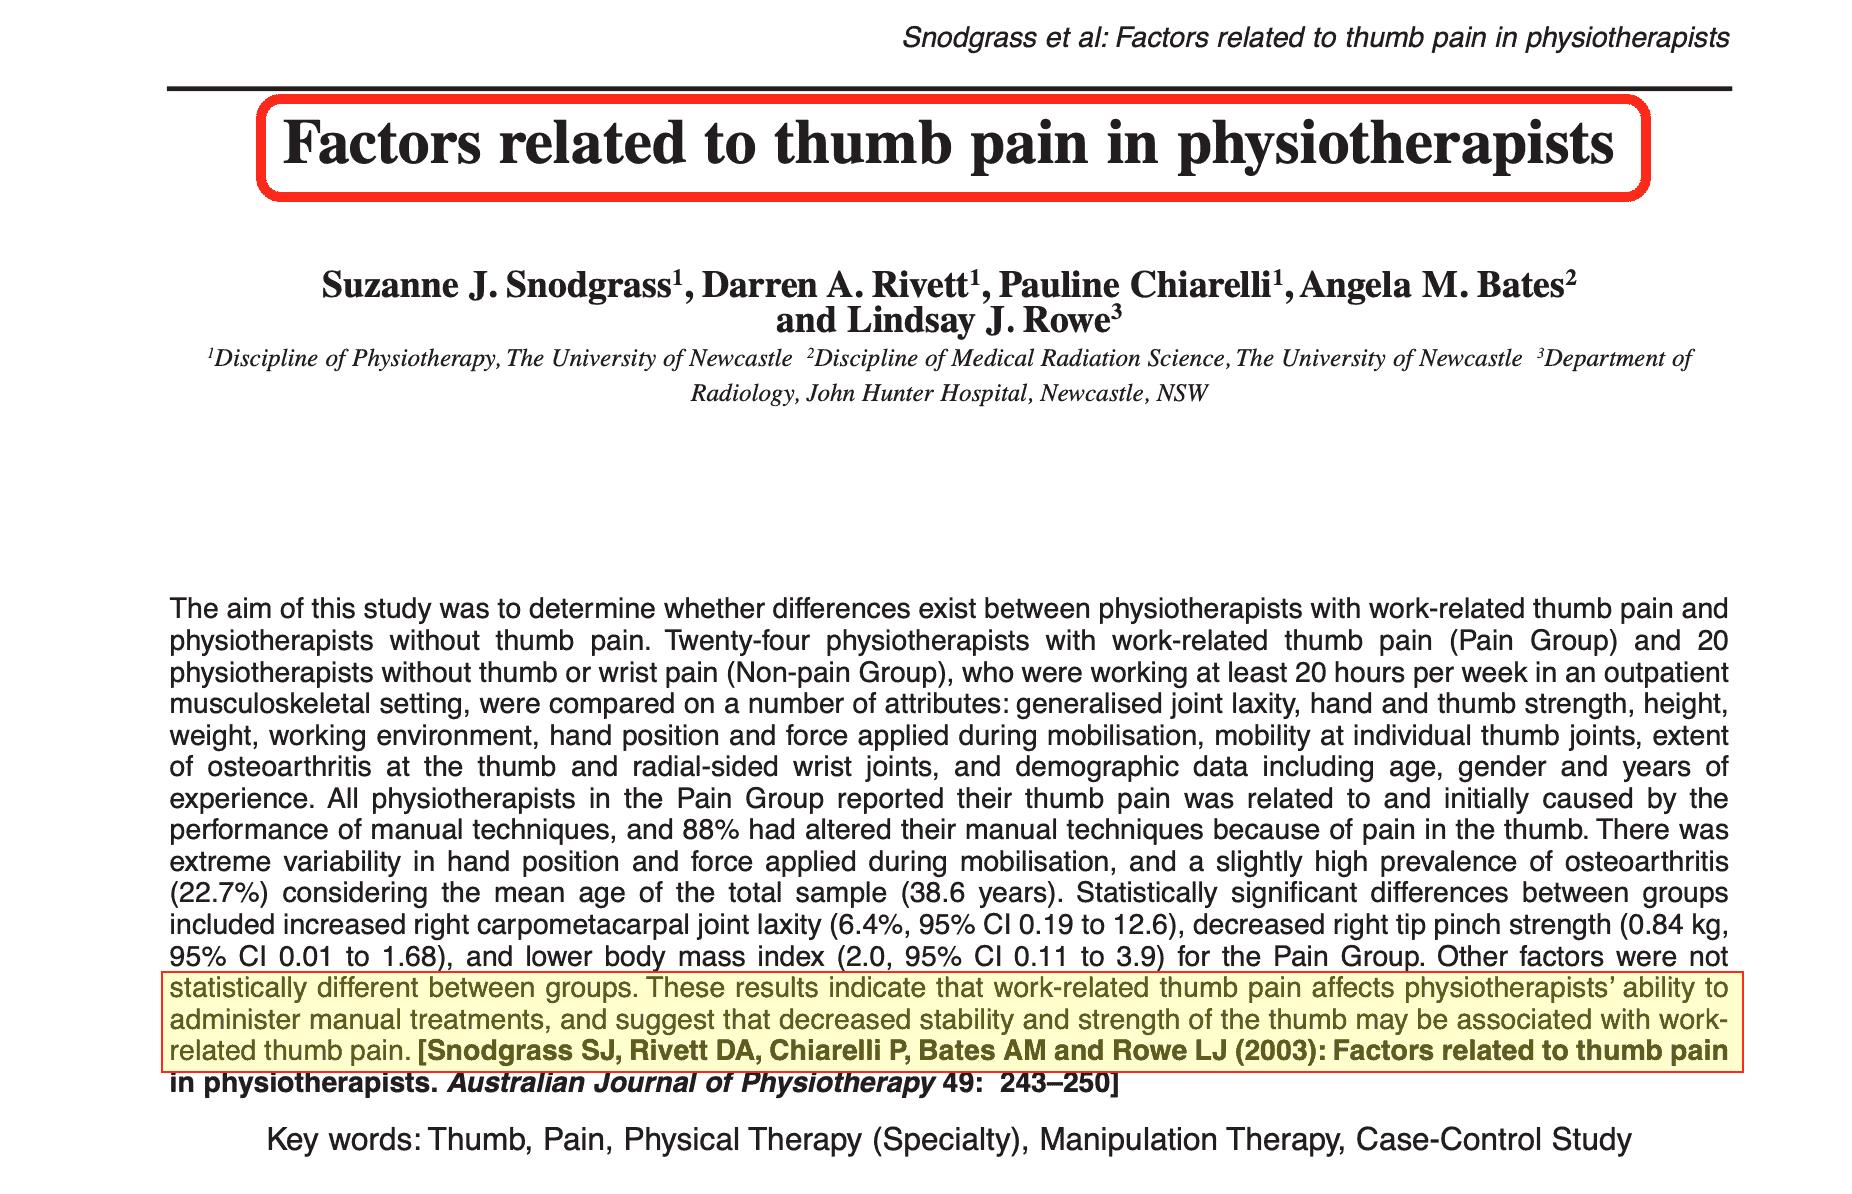 Studio Problemi mano Fisioterapisti Australian Journal of Physiotherapy 2003